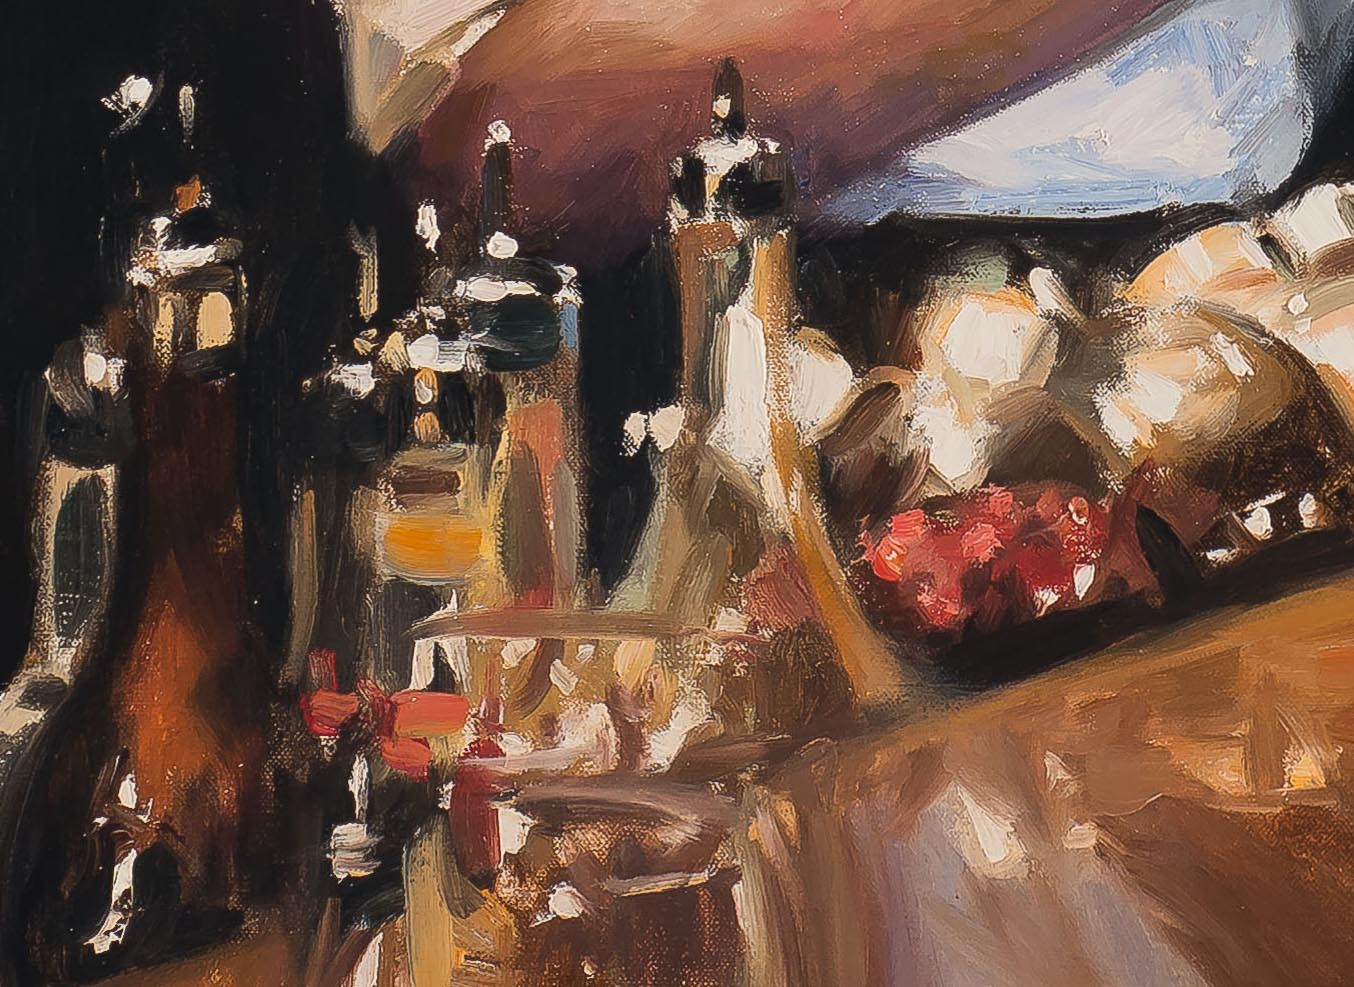 Speak Low, Shanghai 38x52-painting by-Paul Oxborough-detail